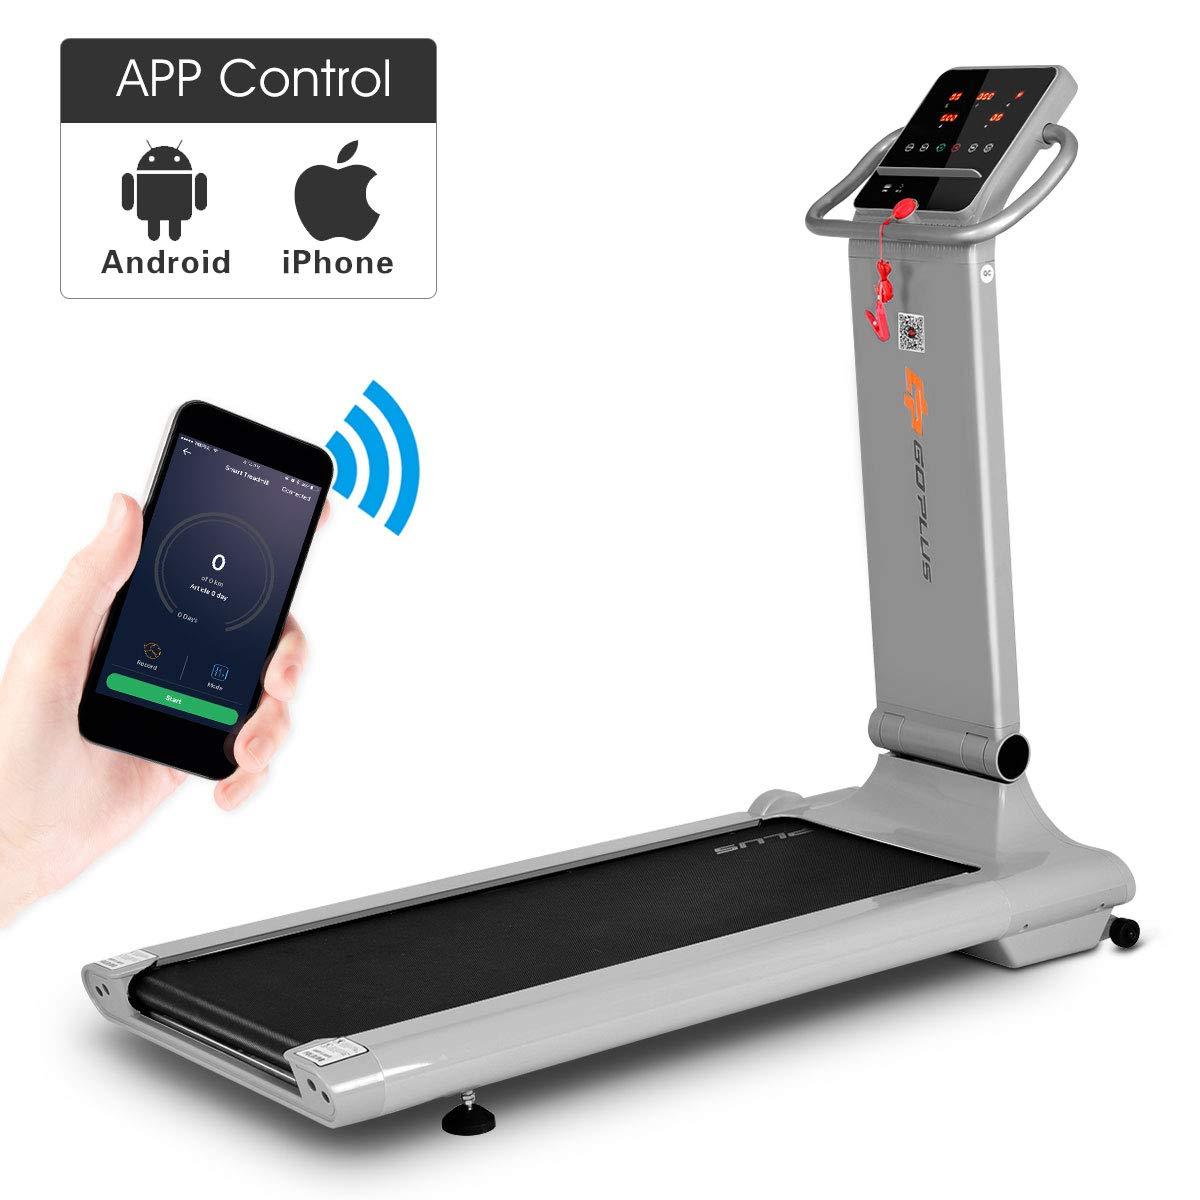 Goplus 1.5HP Electric Folding Treadmill Portable Motorized Running Machine Home Gym Cardio Fitness w/App (Silver)